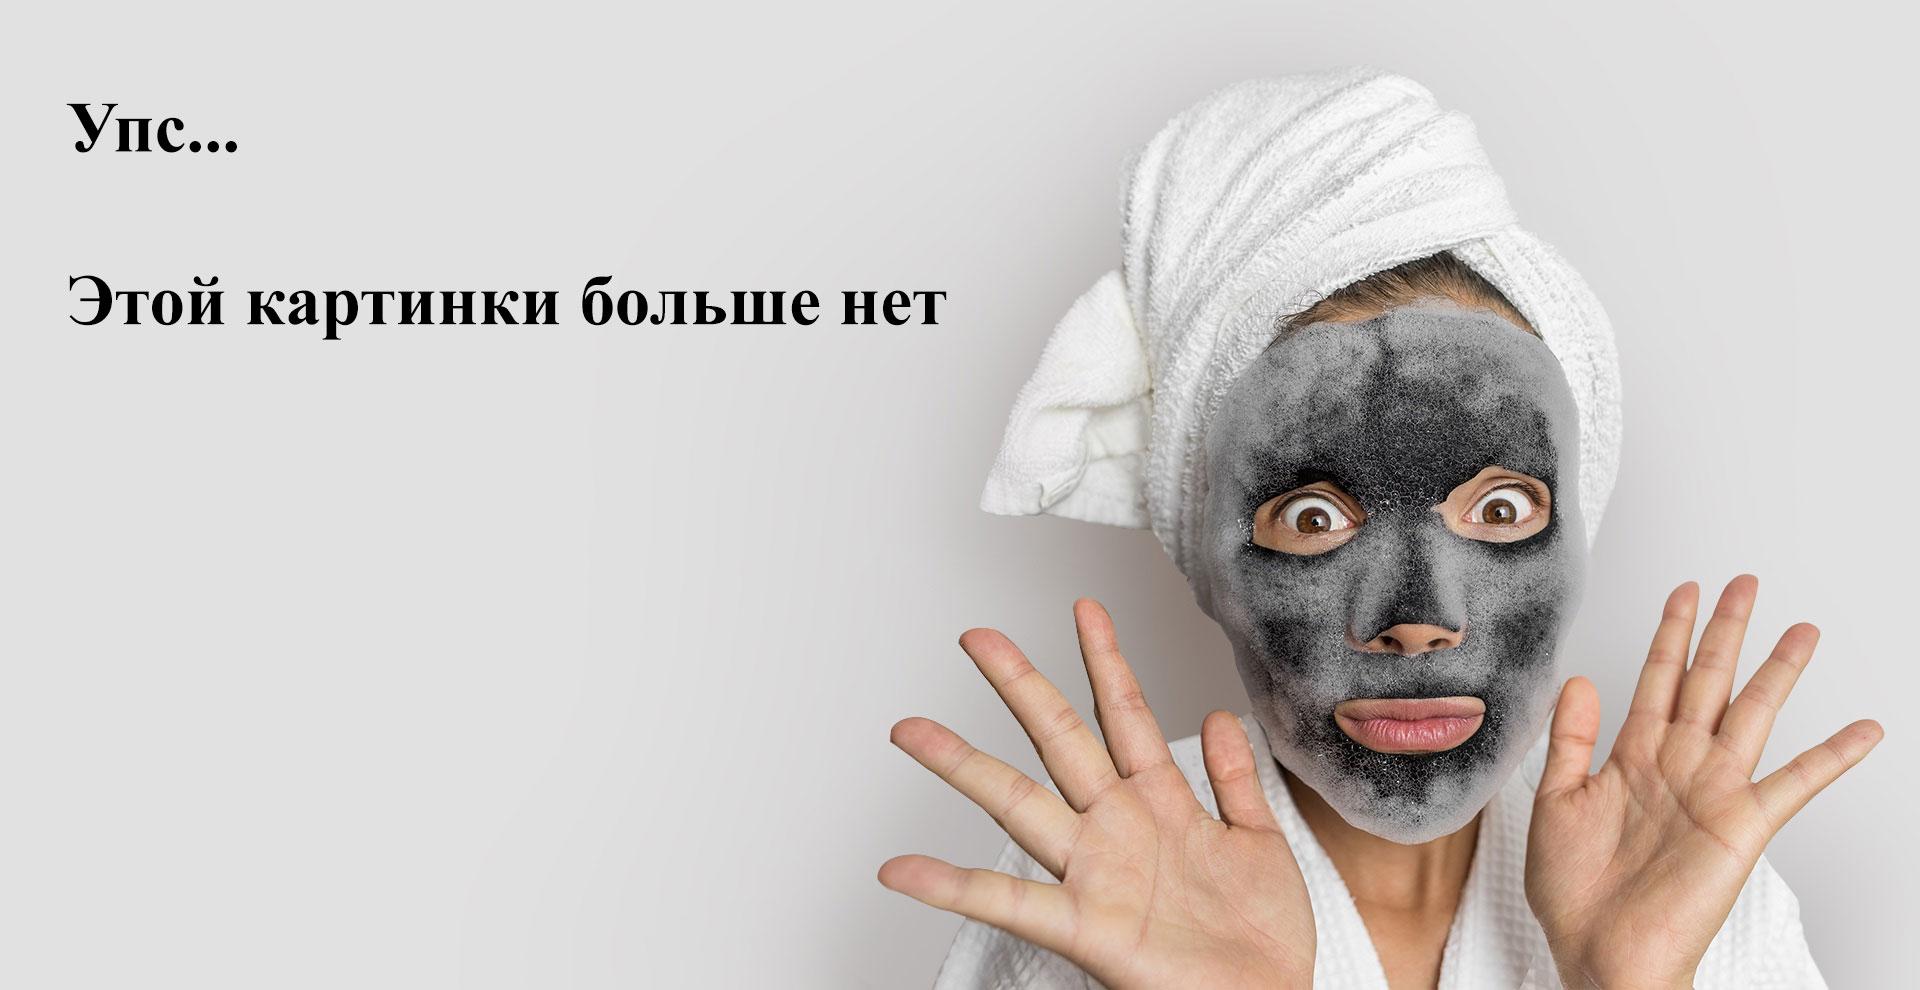 Domix, Nail Prep 2 в 1, Обезжириватель для ногтей, 200 мл